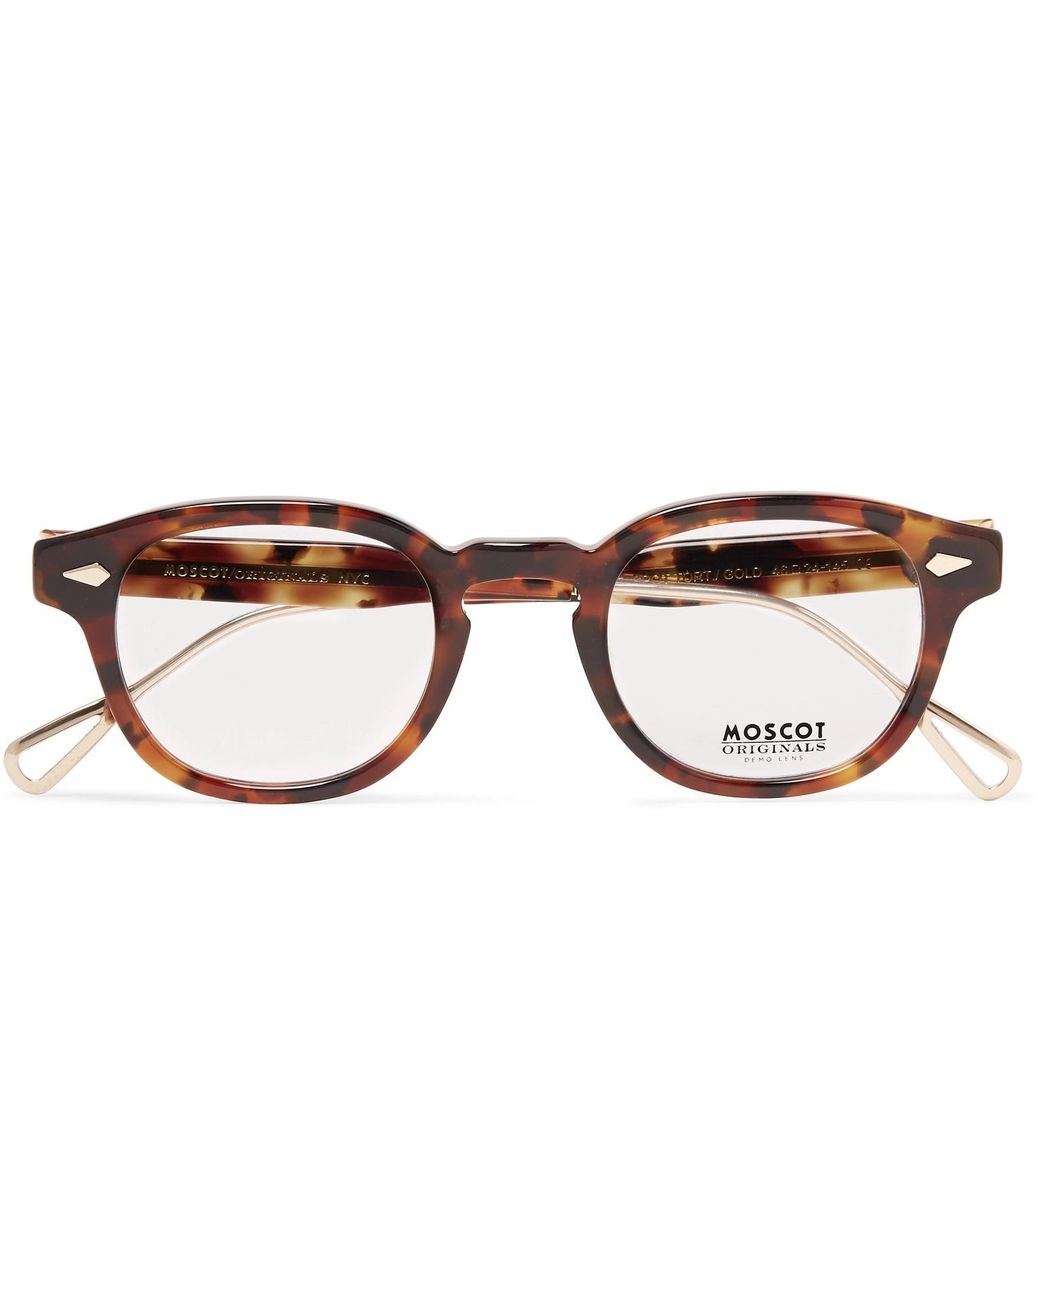 a00c22361c6f Moscot. Men s Brown Lemtosh Round-frame Tortoiseshell Acetate And Gold-tone  Titanium Optical Glasses